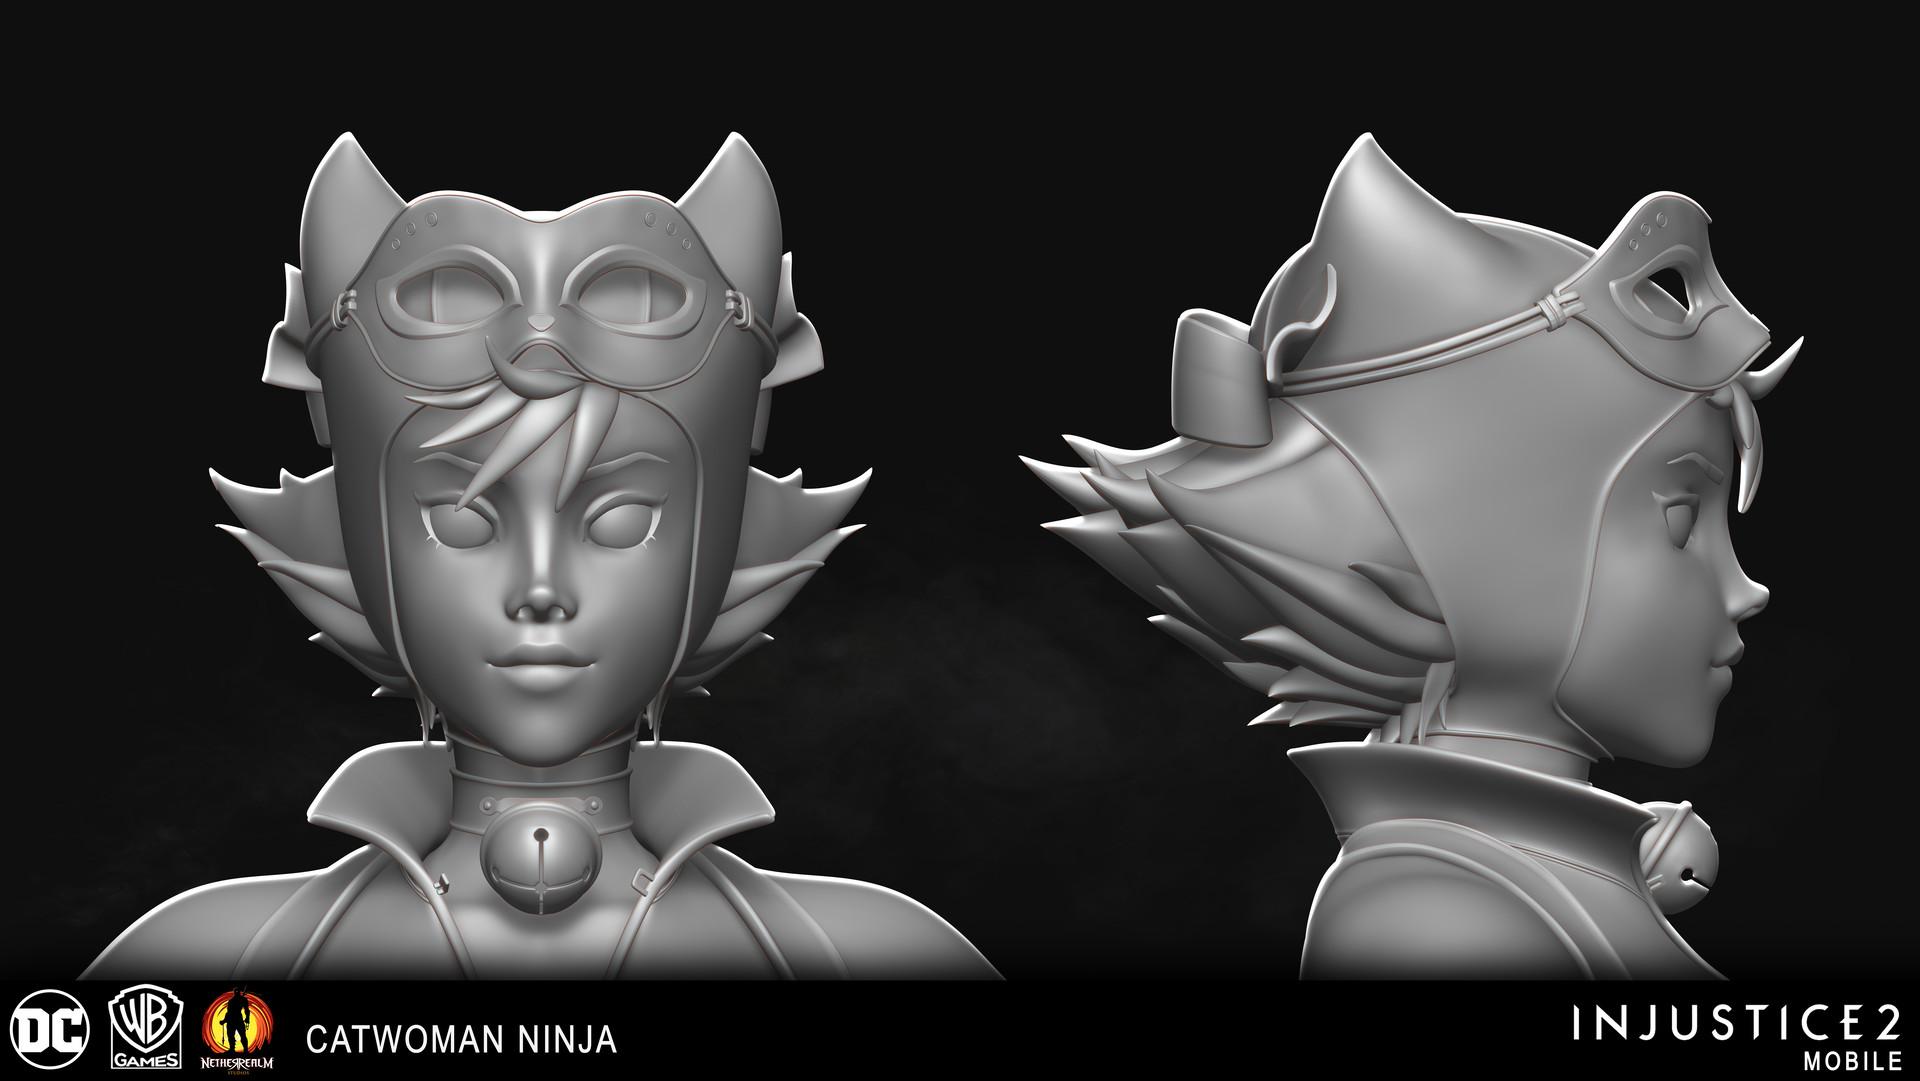 Artstation Injustice 2 Mobile Catwoman Ninja Nick Cashio